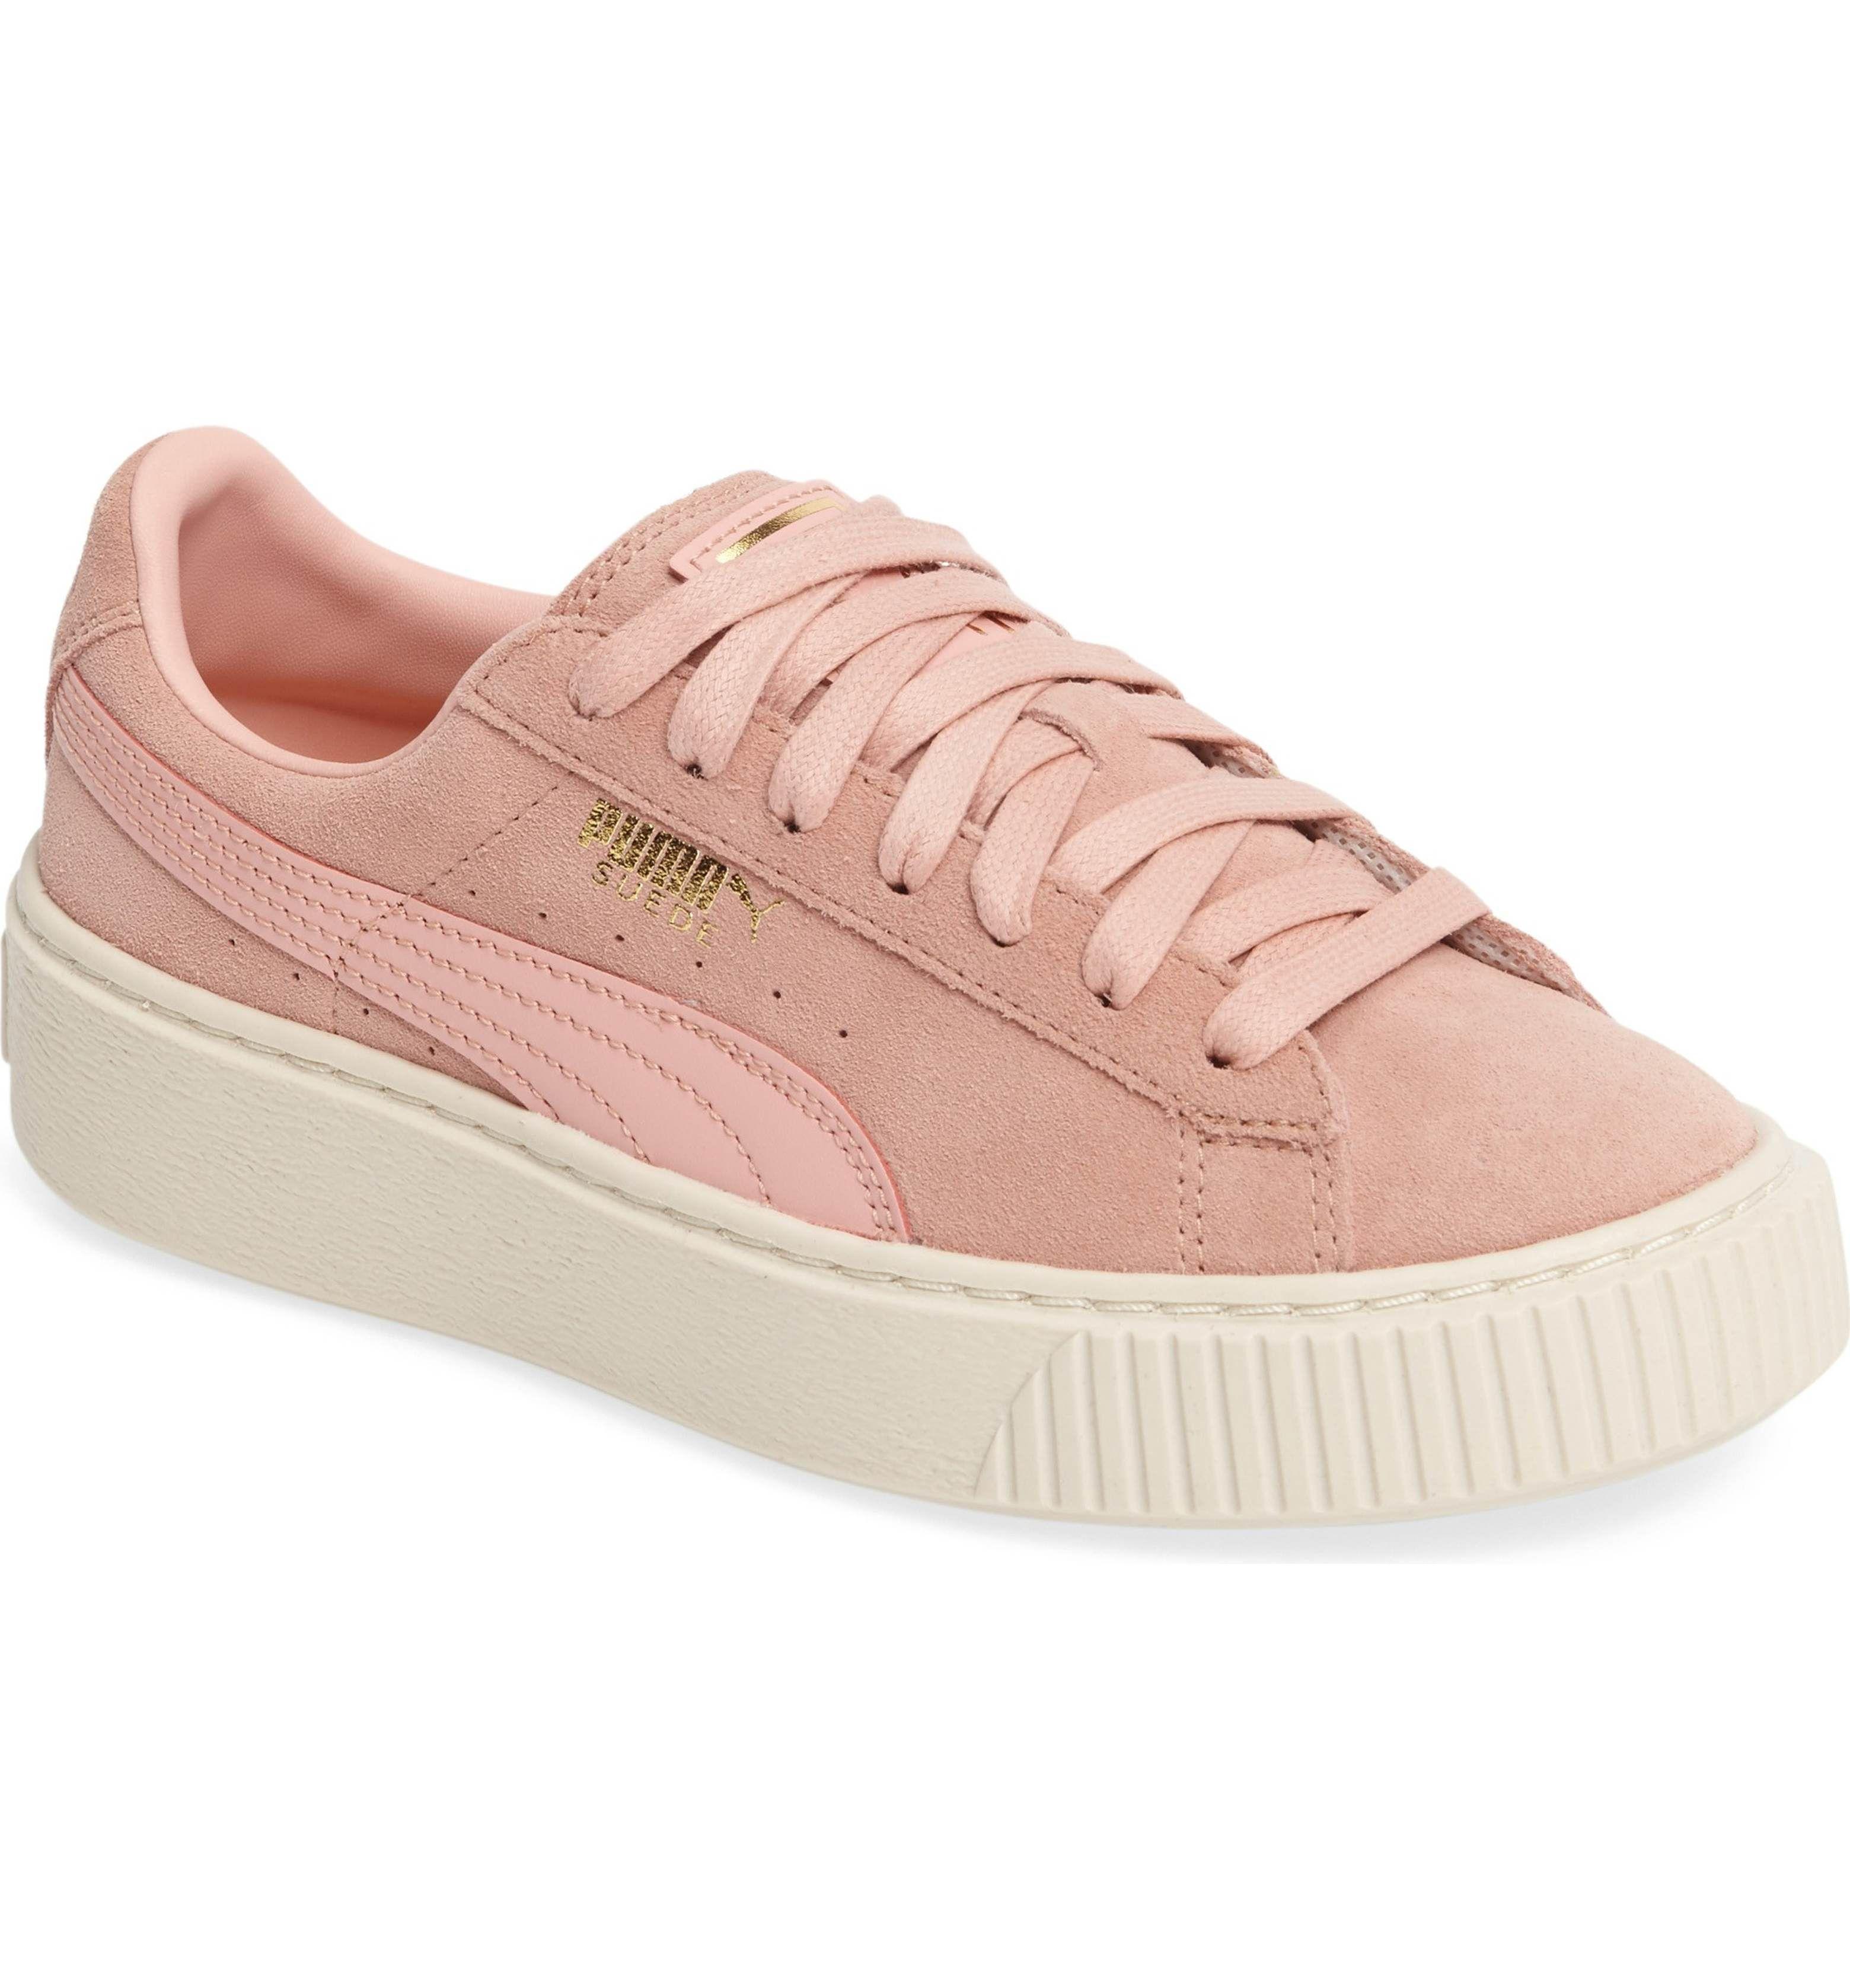 Puma Suede Platform Core Gum Sneakers & Deportivas Mujer nZpX3no3